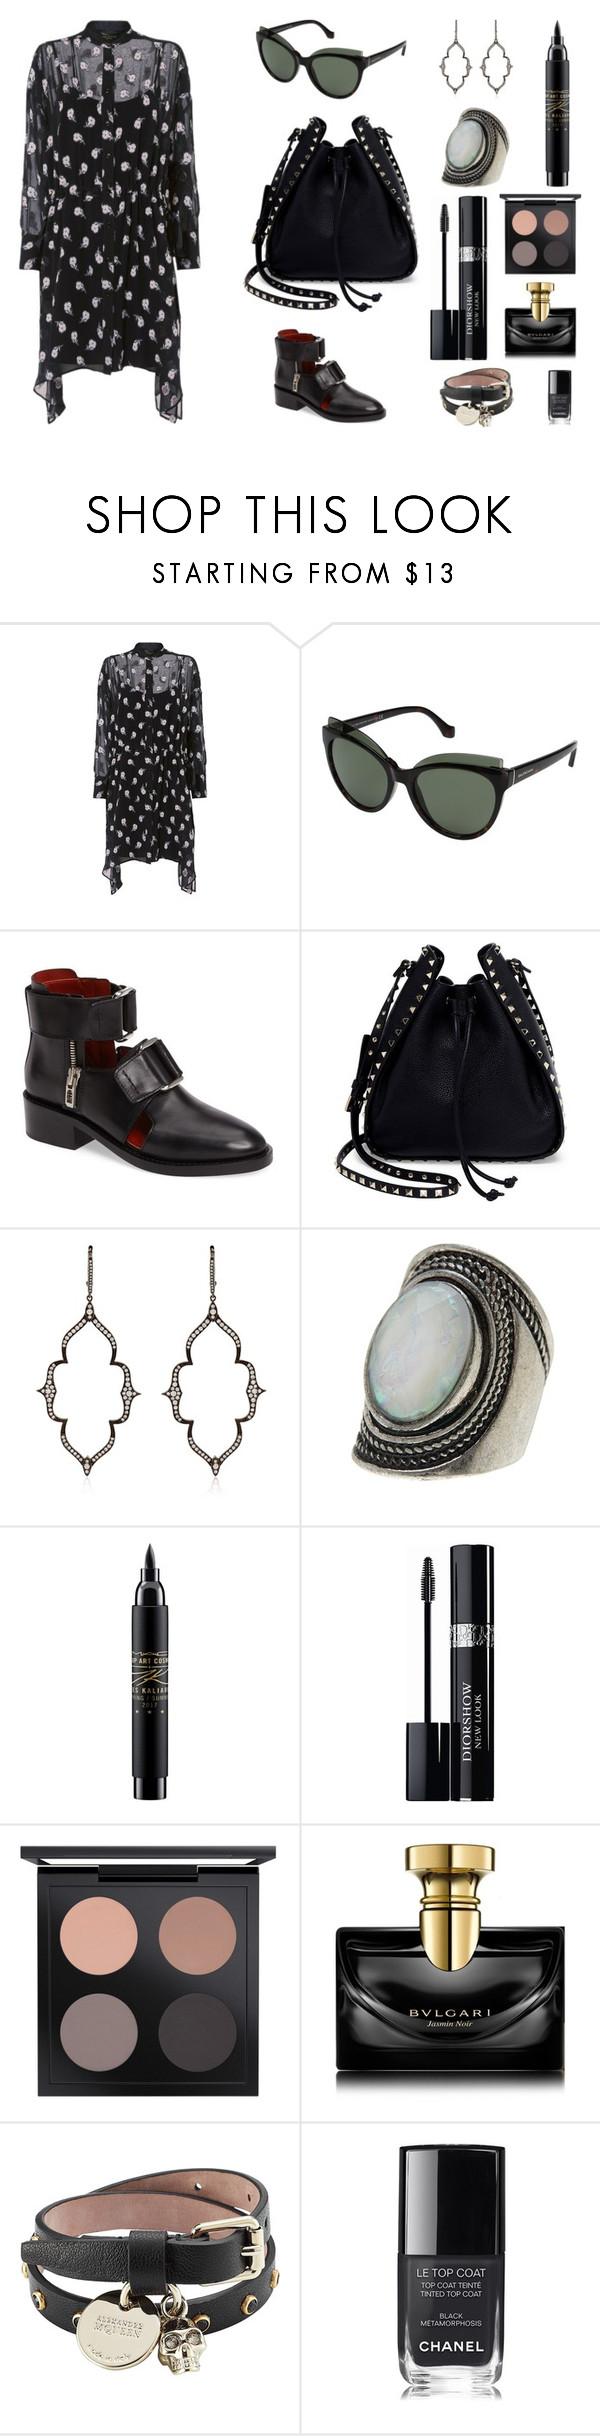 """Dress 2"" by jessblock on Polyvore featuring moda, rag & bone, Balenciaga, 3.1 Phillip Lim, Valentino, Stone Paris, Free Press, MAC Cosmetics, Christian Dior e Bulgari"